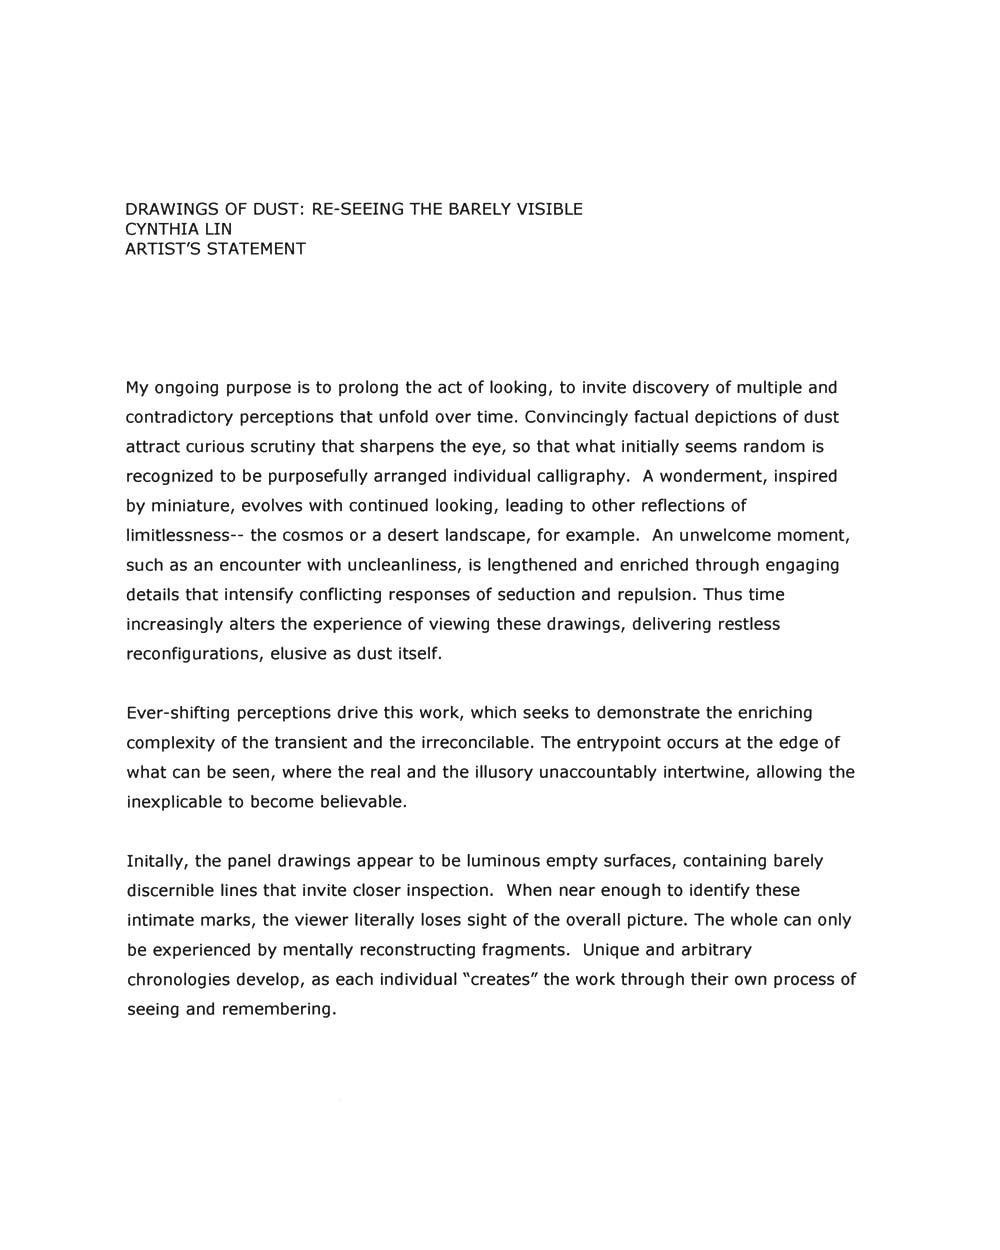 Cynthia Lin's Artist Statement (3)